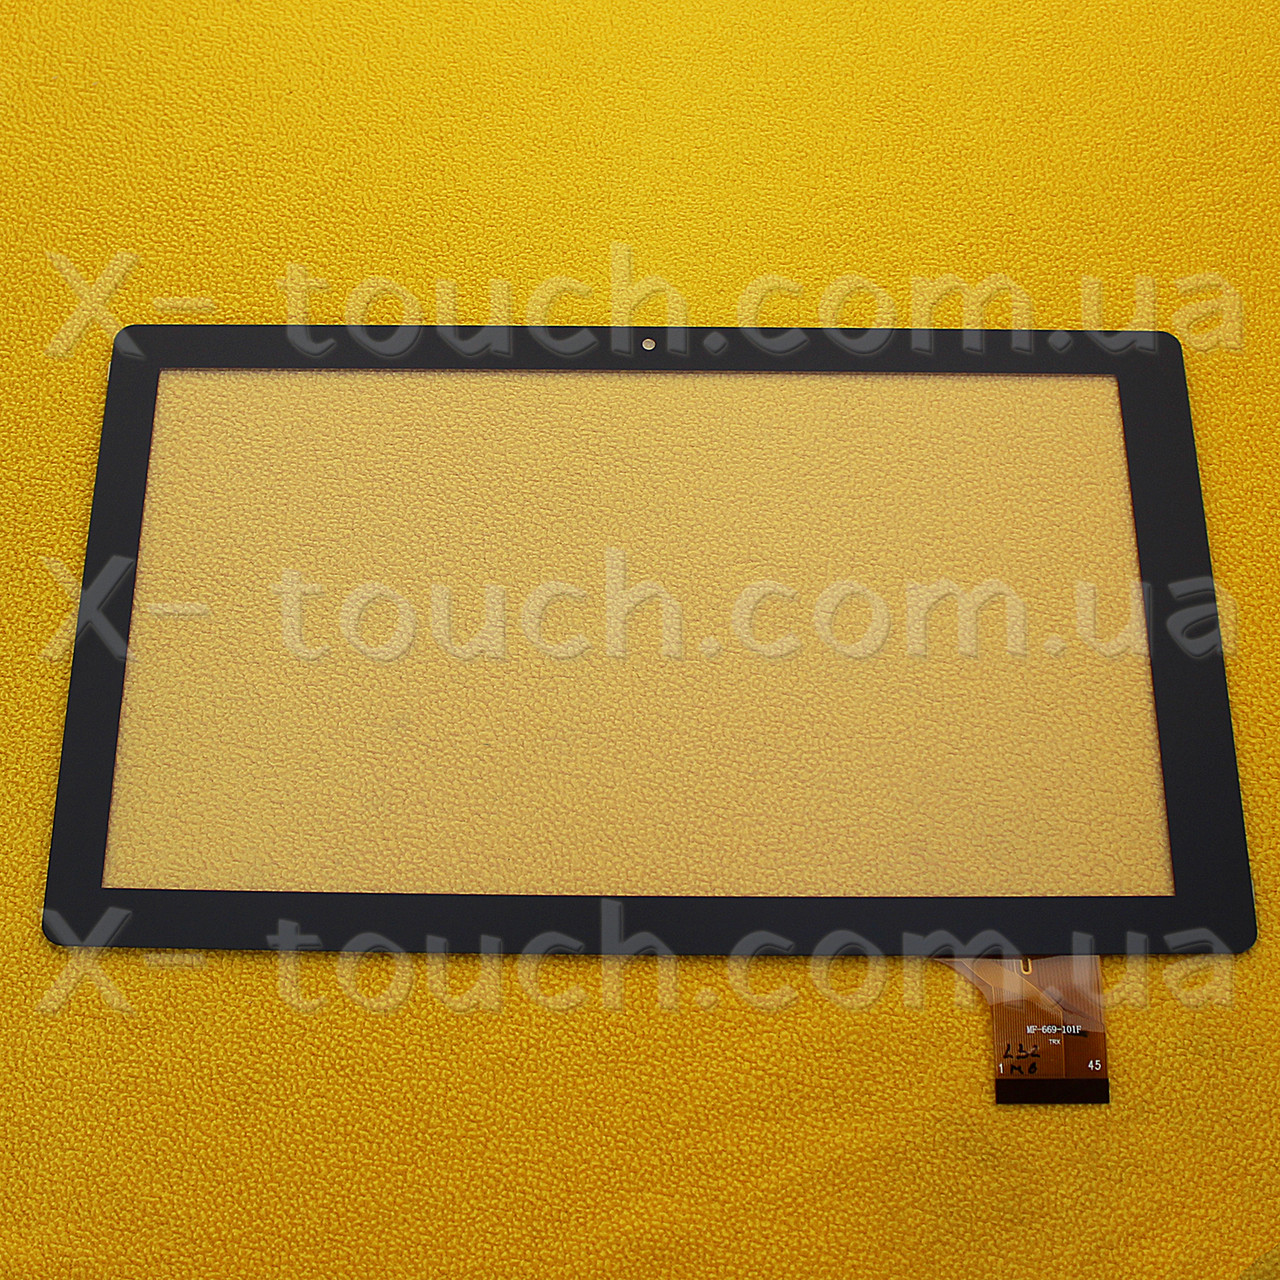 Тачскрин, сенсор  XC-PG1010-031-A0 FPC  для планшета